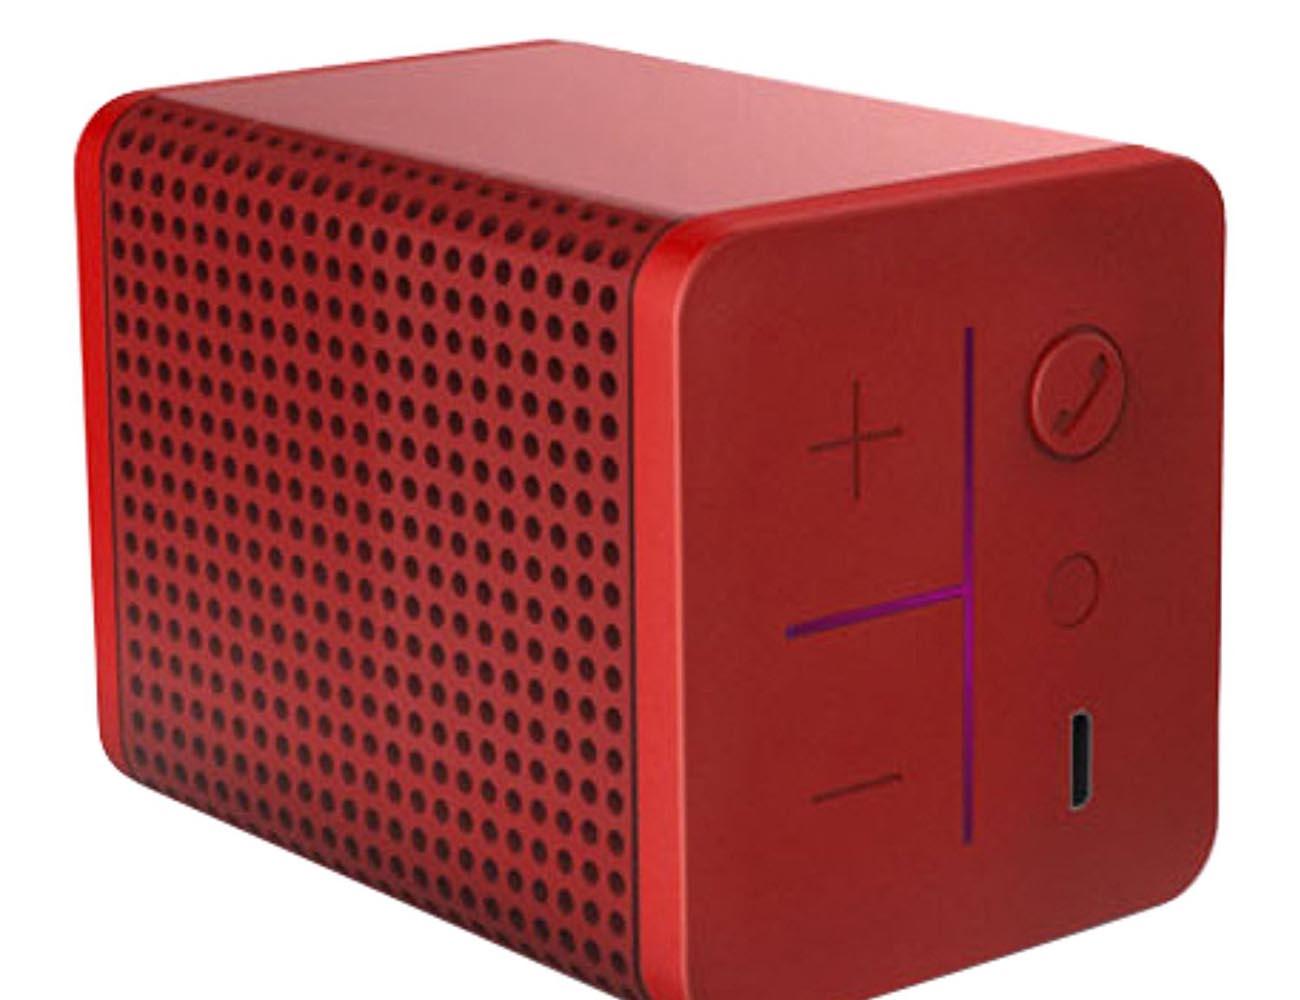 MiPow BOOMIN Portable Bluetooth Speaker